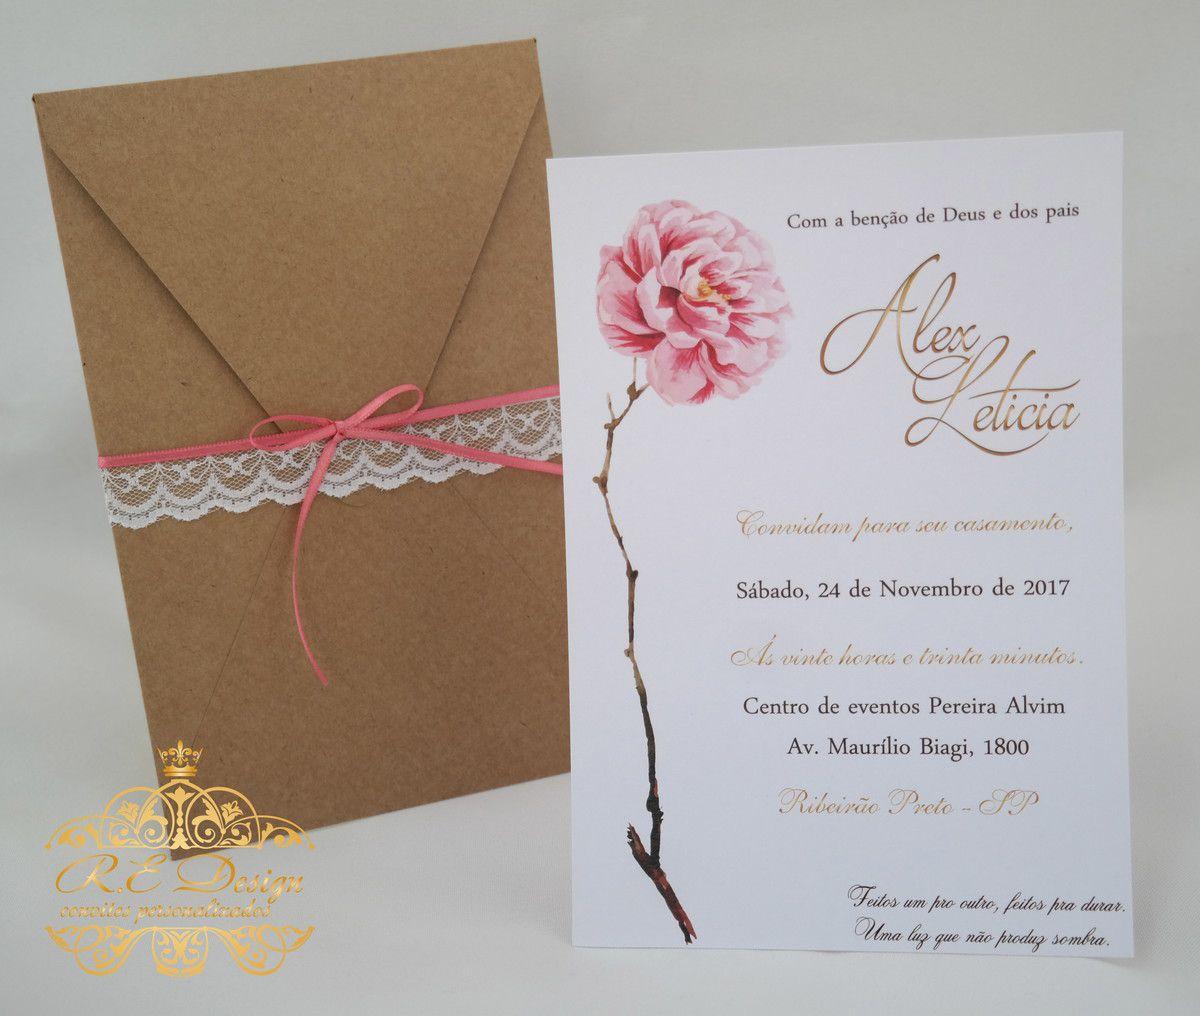 Convite de Casamento com Envelope e Renda